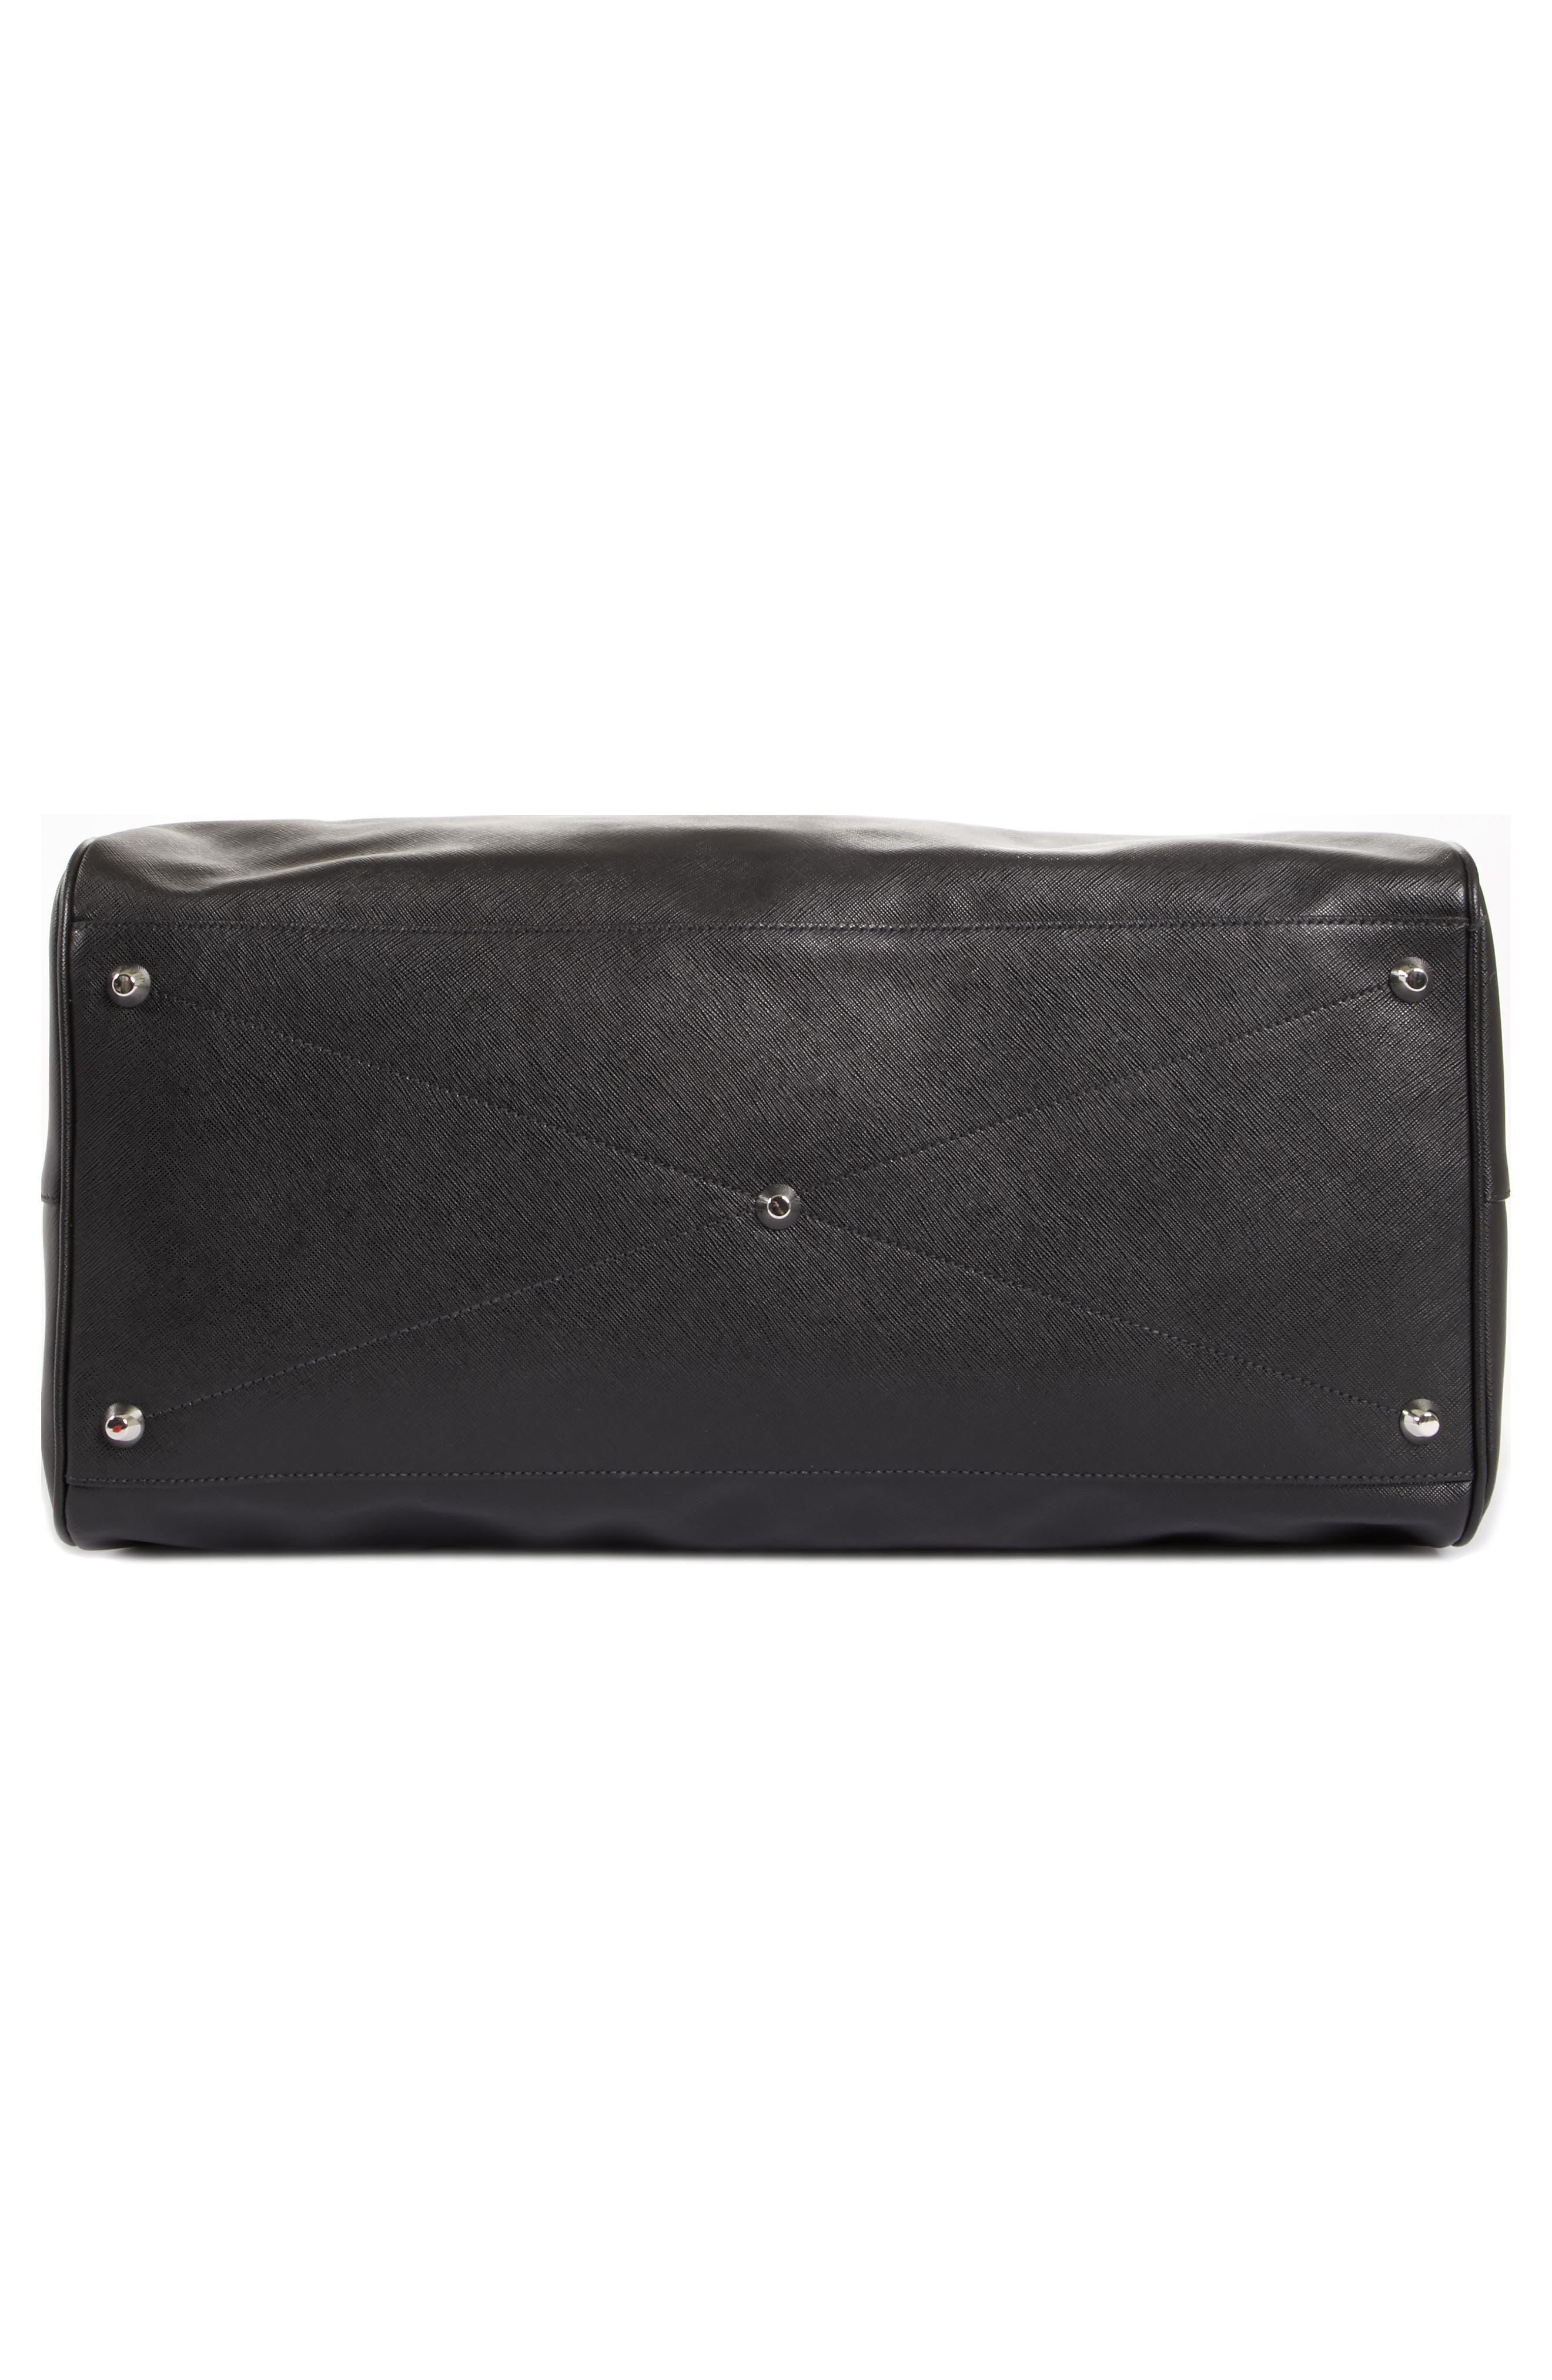 Saffiano Leather Duffel Bag,                             Alternate thumbnail 6, color,                             001